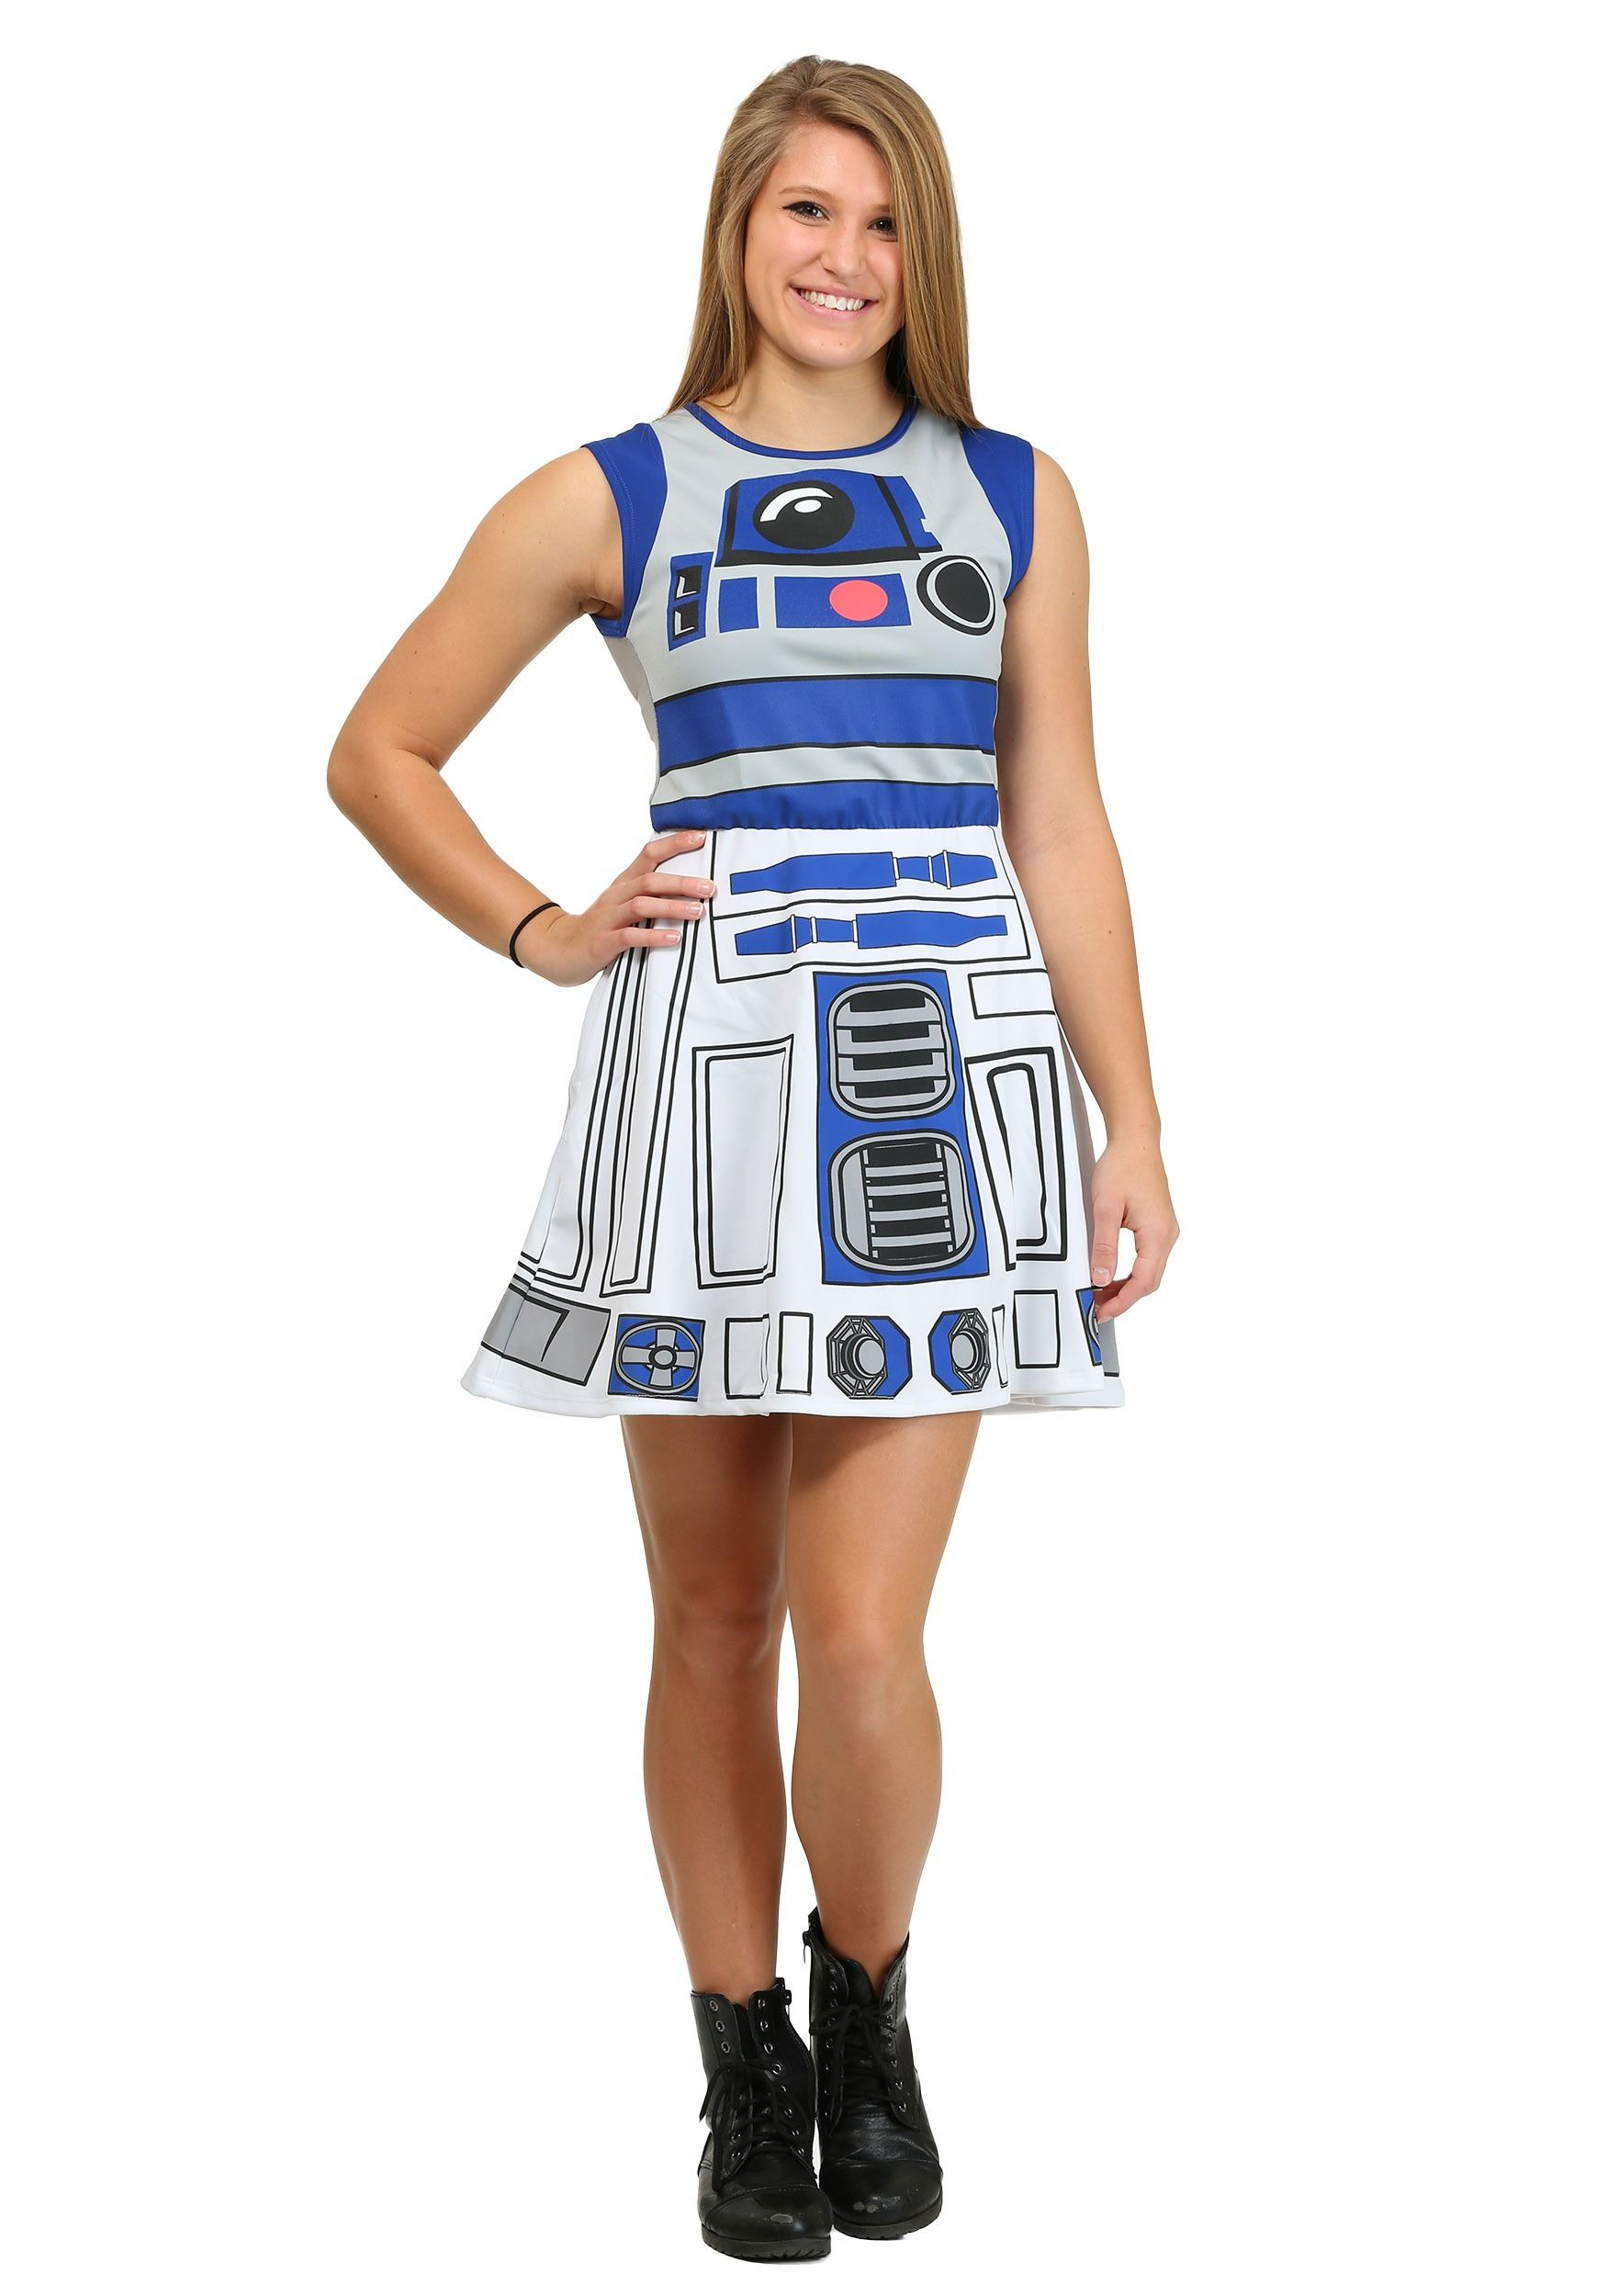 r2d2- Maggie R2d2 Costume 2c8e0a634